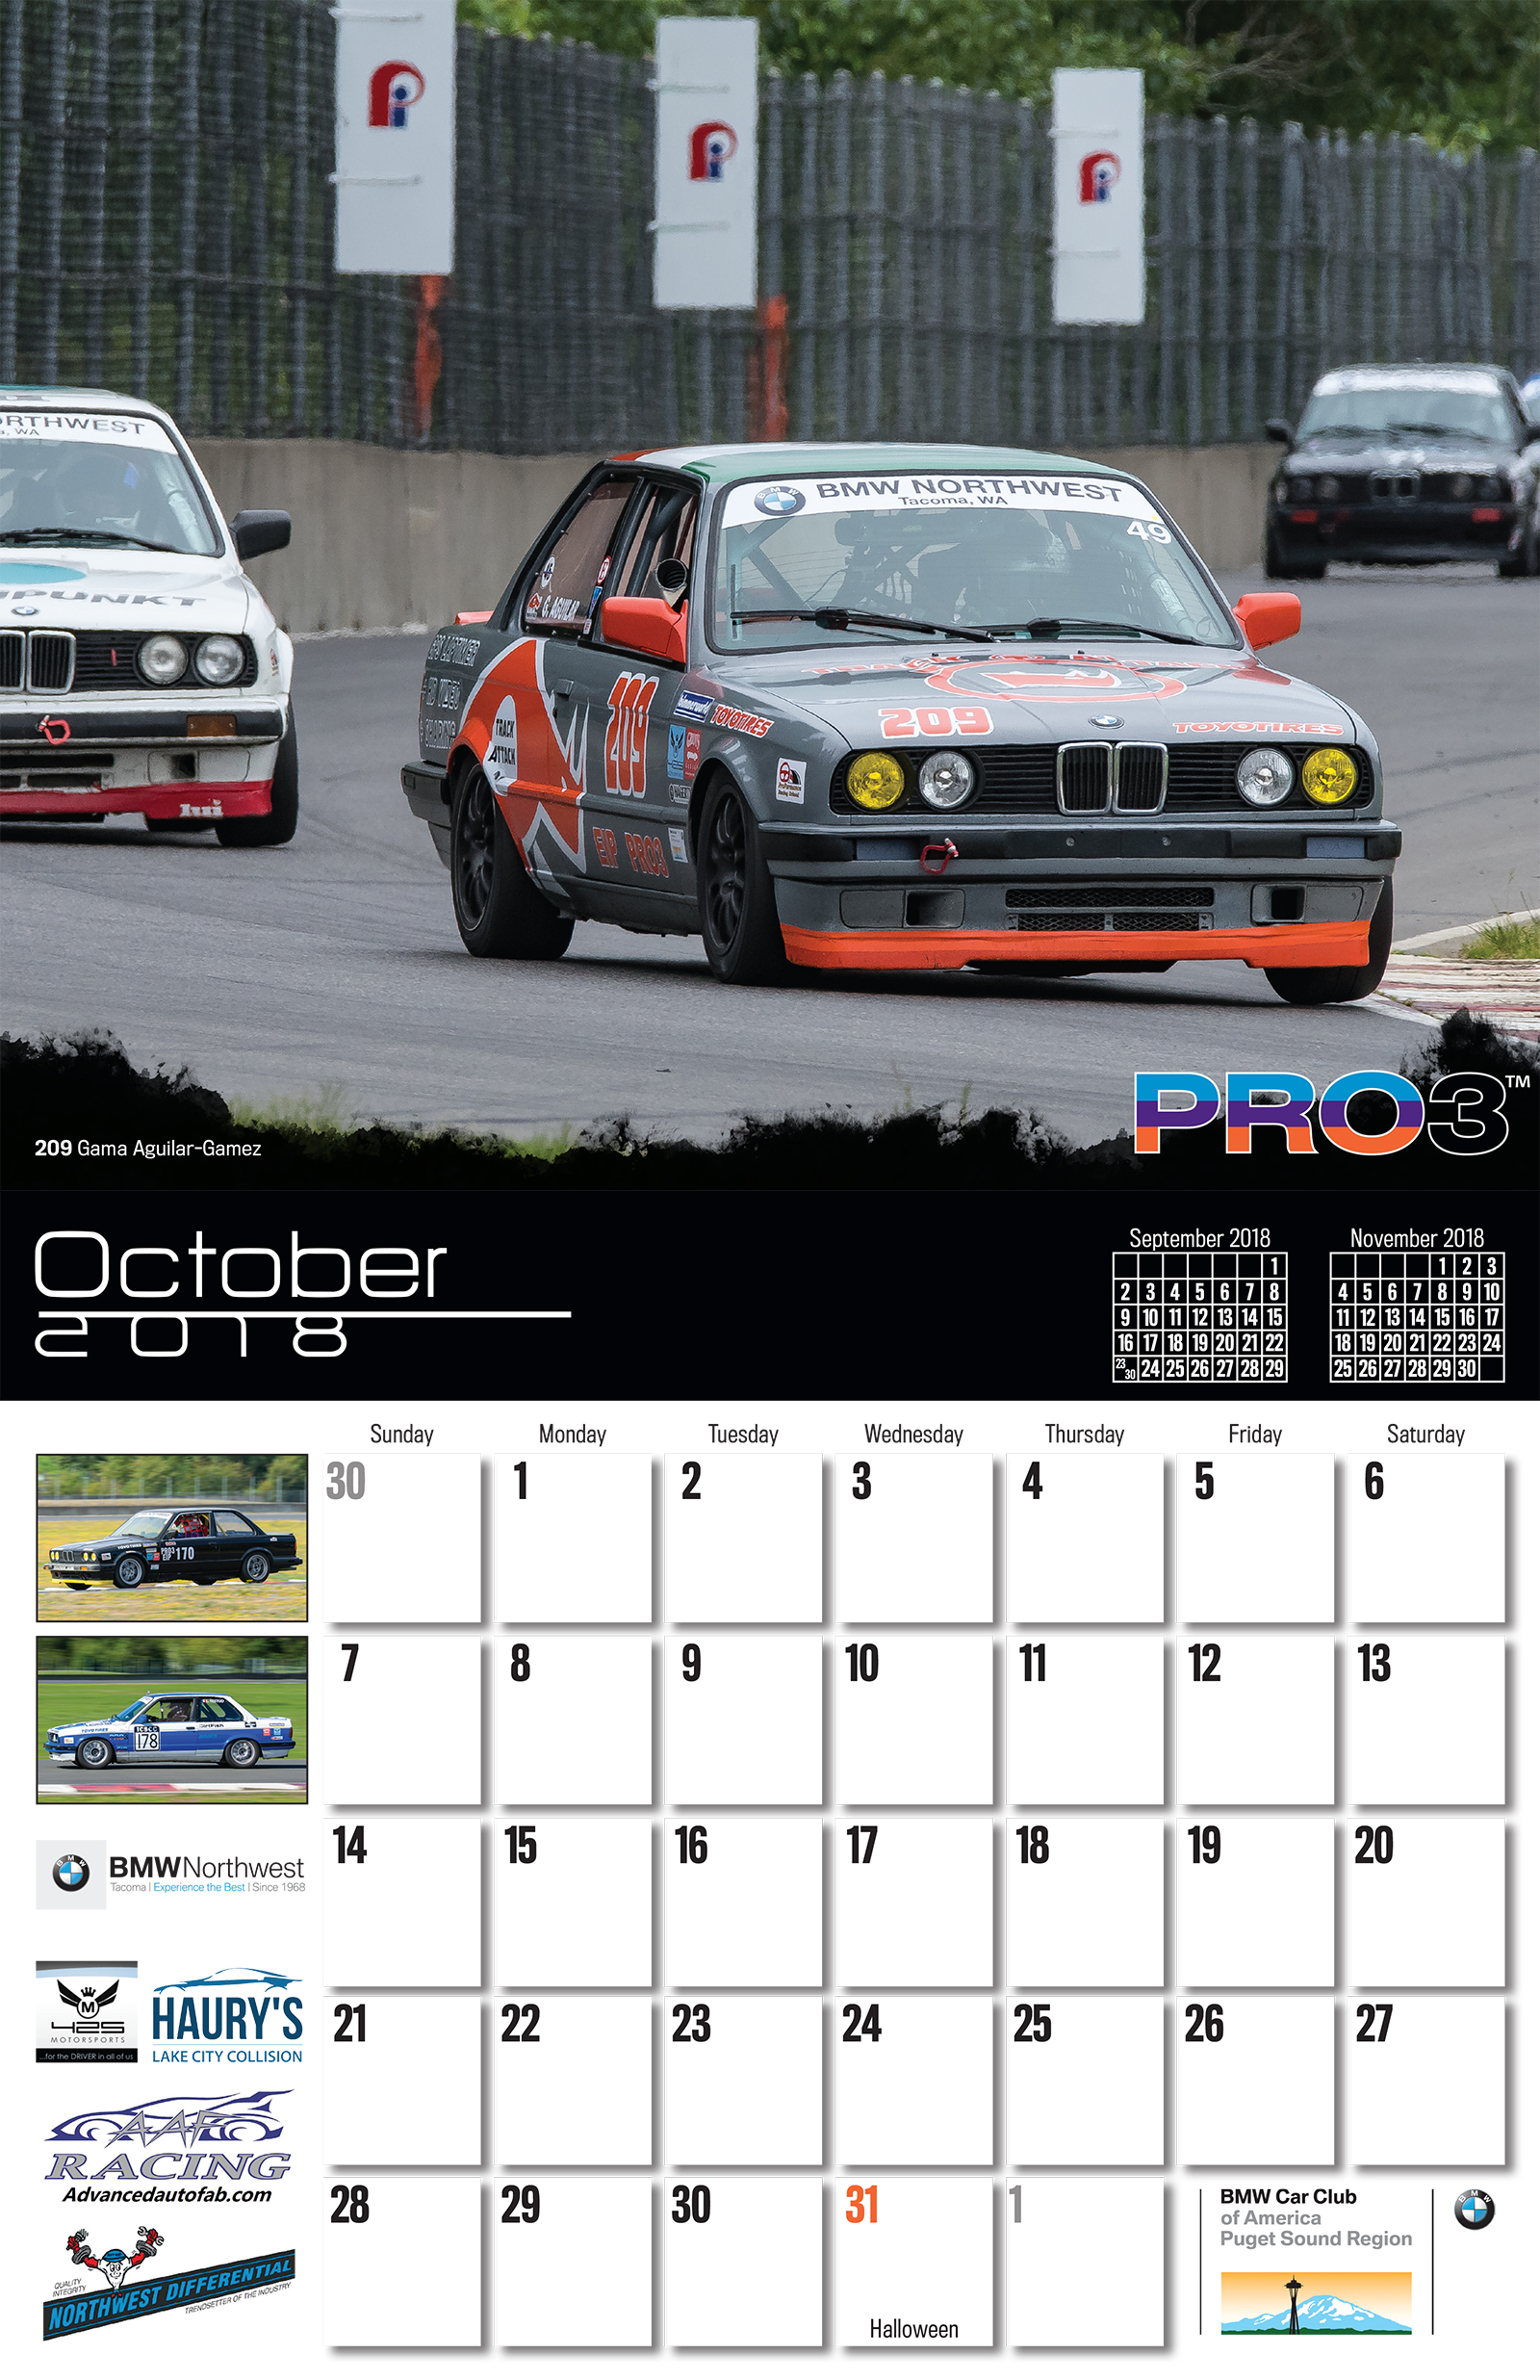 PRO3_Calendar_2018_10-Oct.jpg